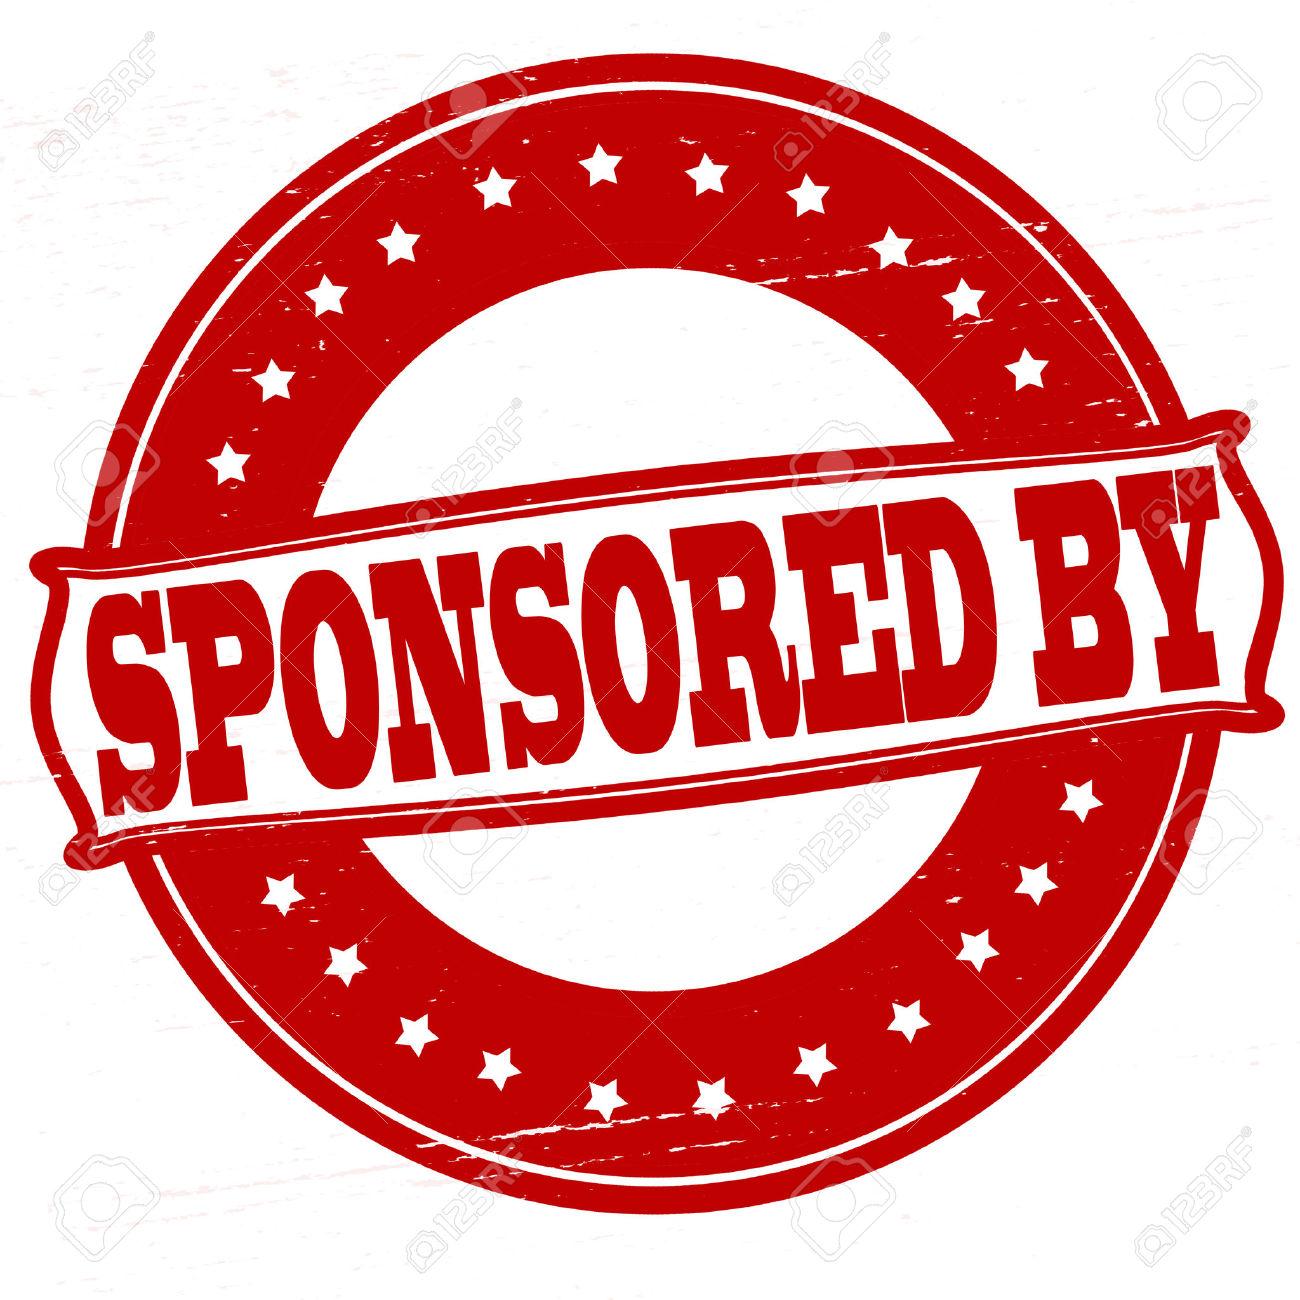 how to value a sponsorship martin kihn clip art eyes cartoon clip art eyes cartoon